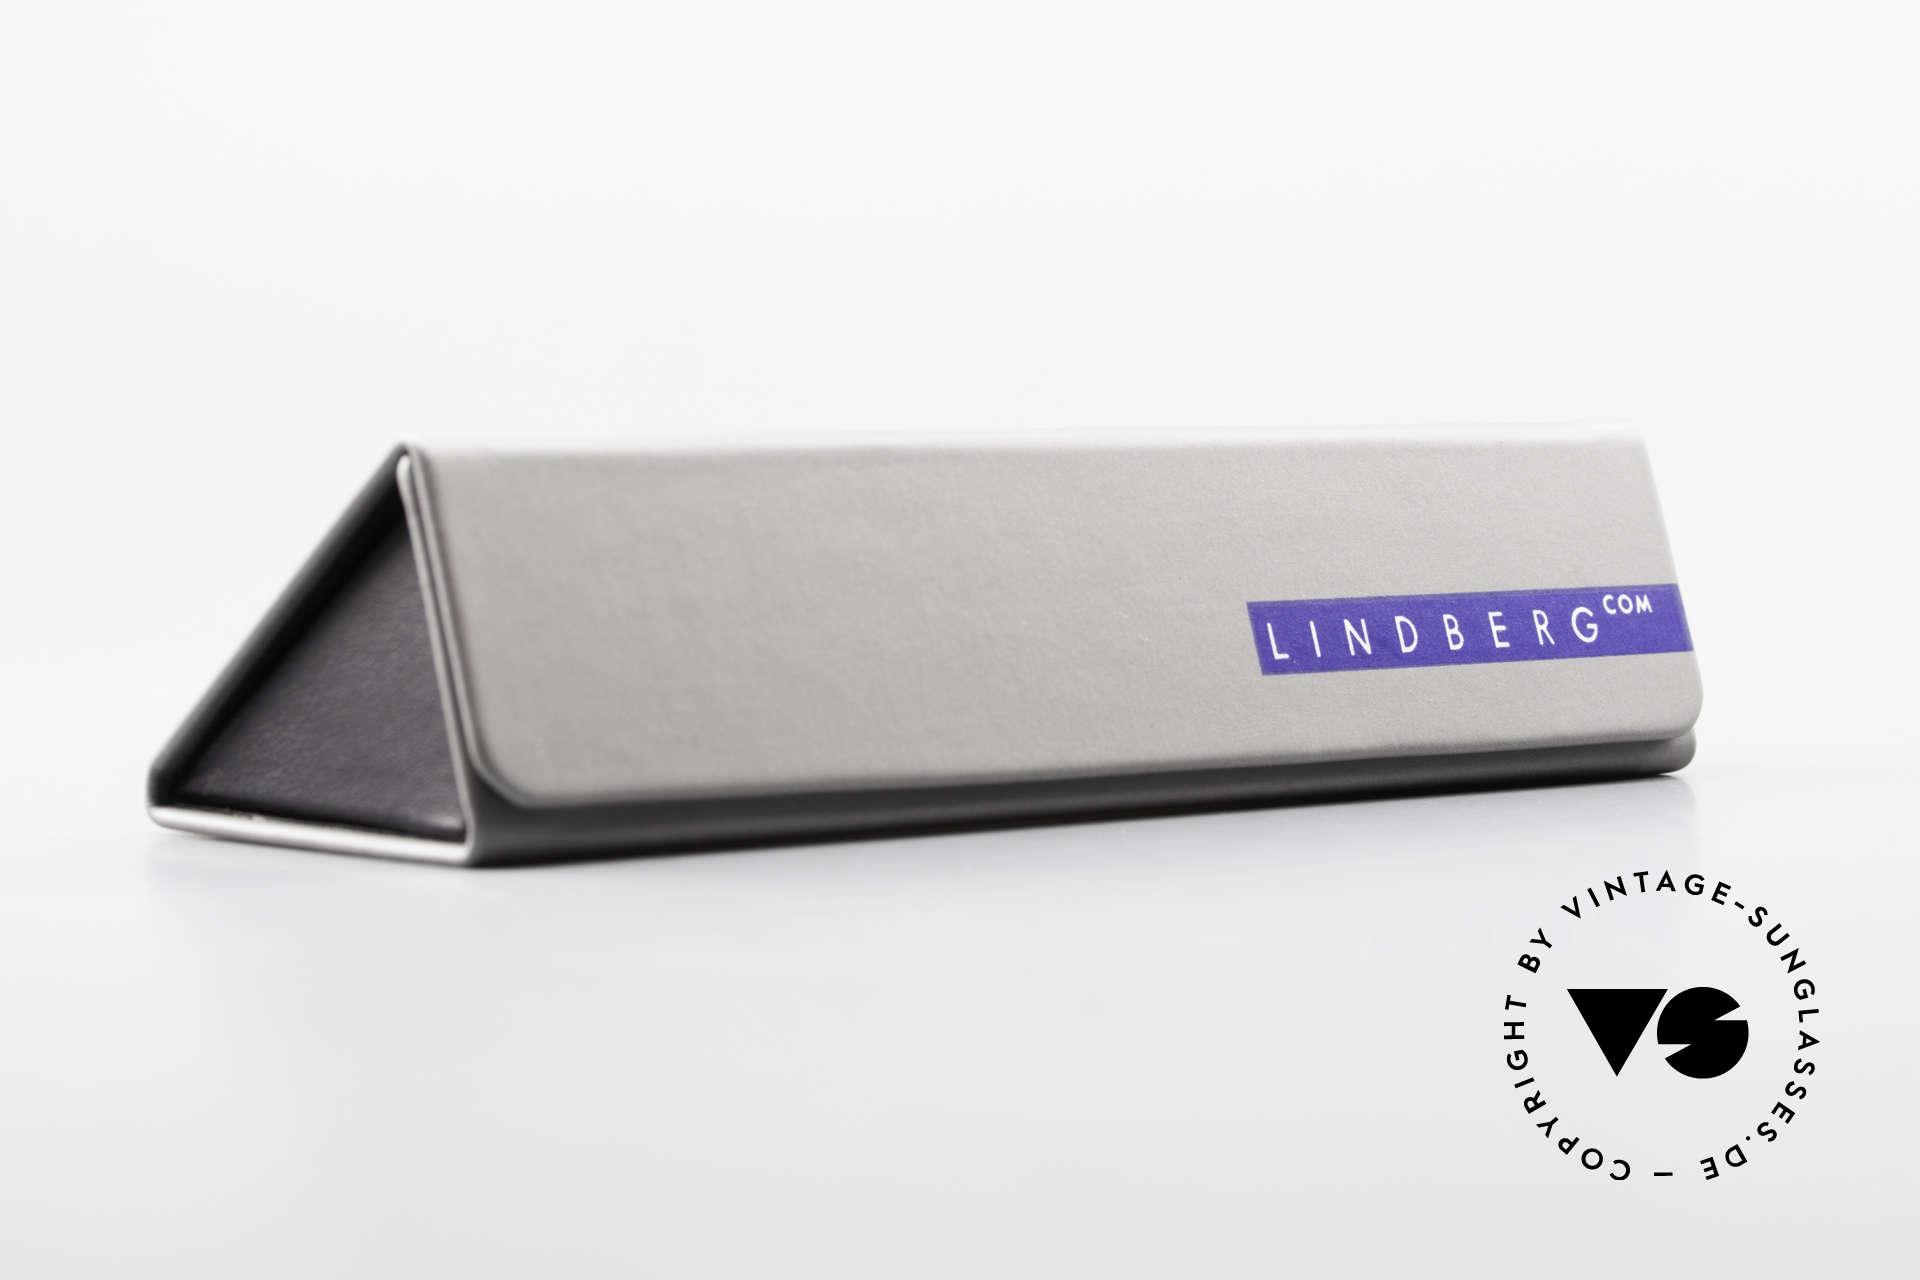 Lindberg Panto Air Titan Rim X Small Titanium Frame Panto, Size: extra small, Made for Men and Women